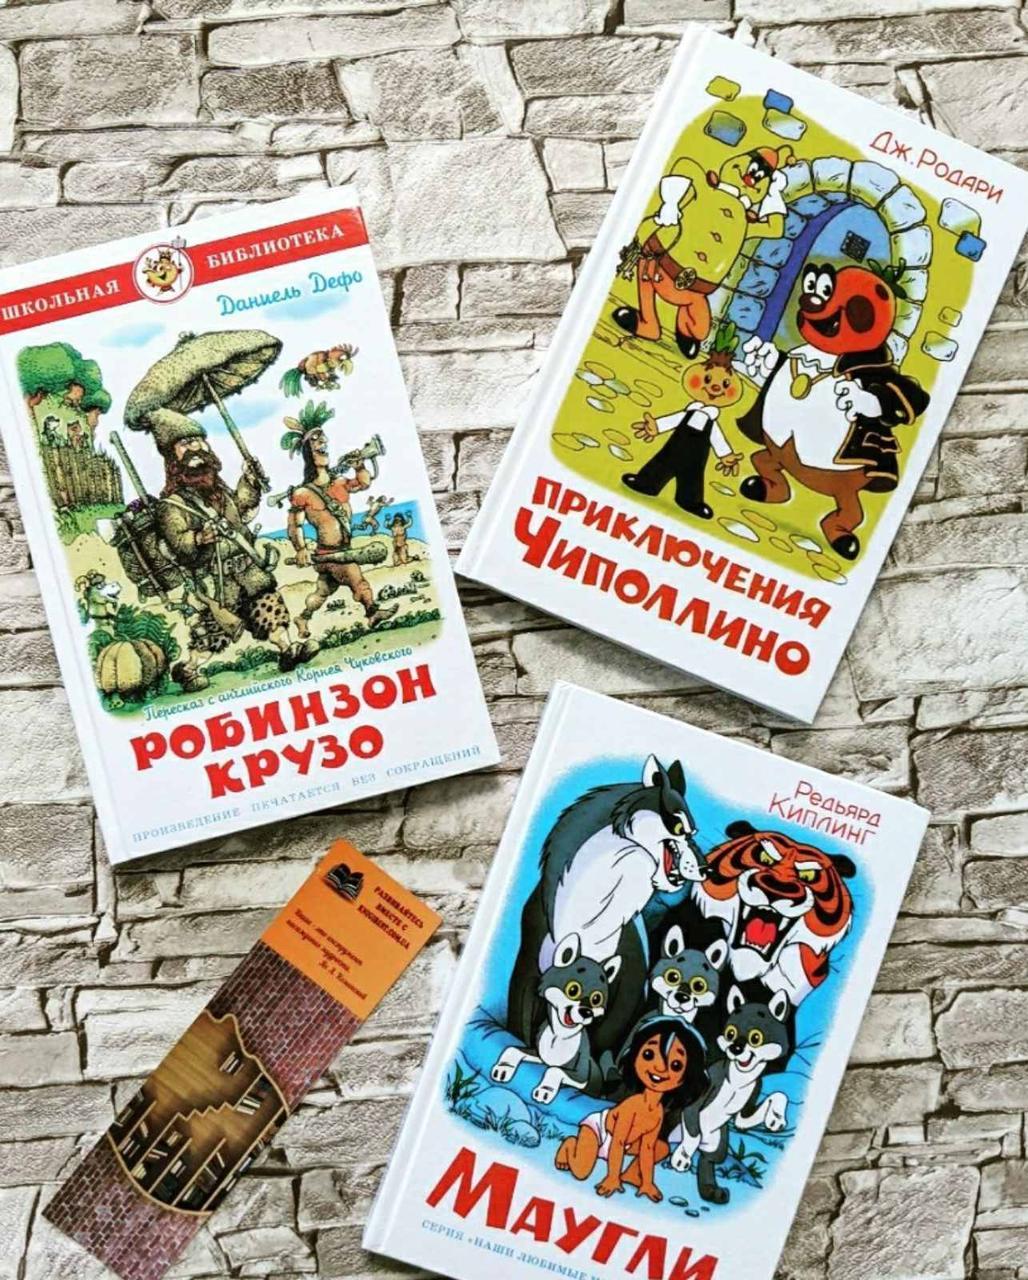 "Набор книг ""Робинзон Крузо"" Даниэль Дефо, ""Маугли"" Редьярд Киплинг,""Приключения Чиполлино""  Родари Джанни"